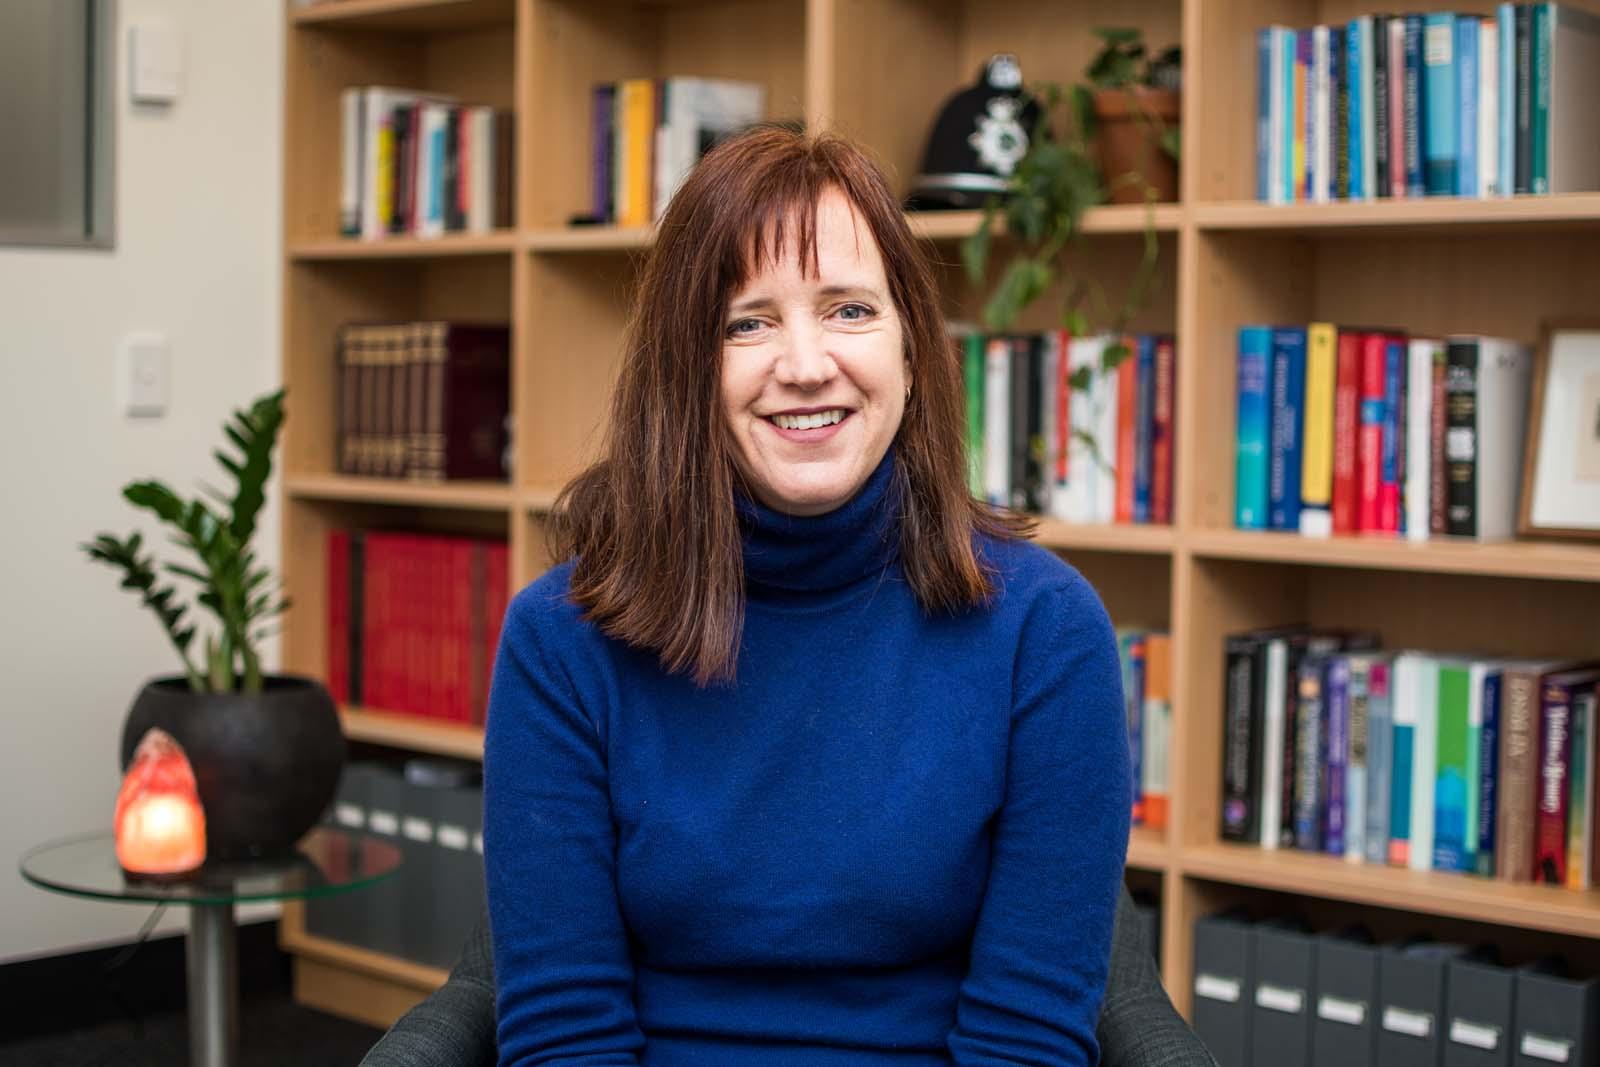 Martine Powell